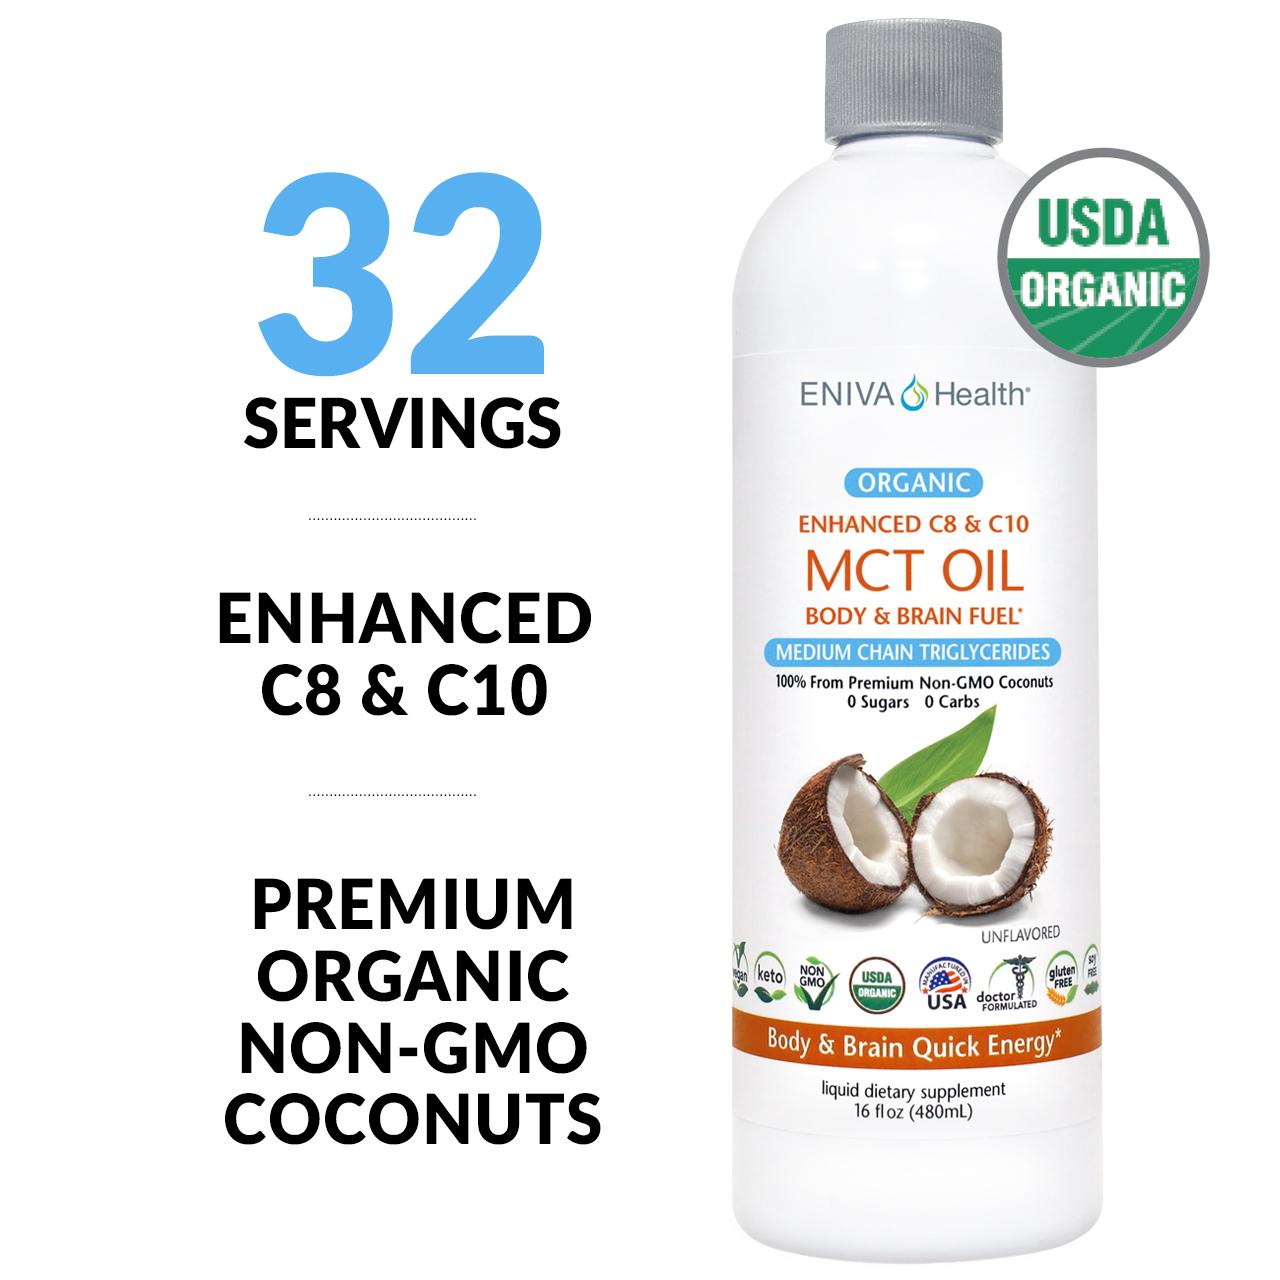 mct-oil-mini-usda-organic-1.jpg